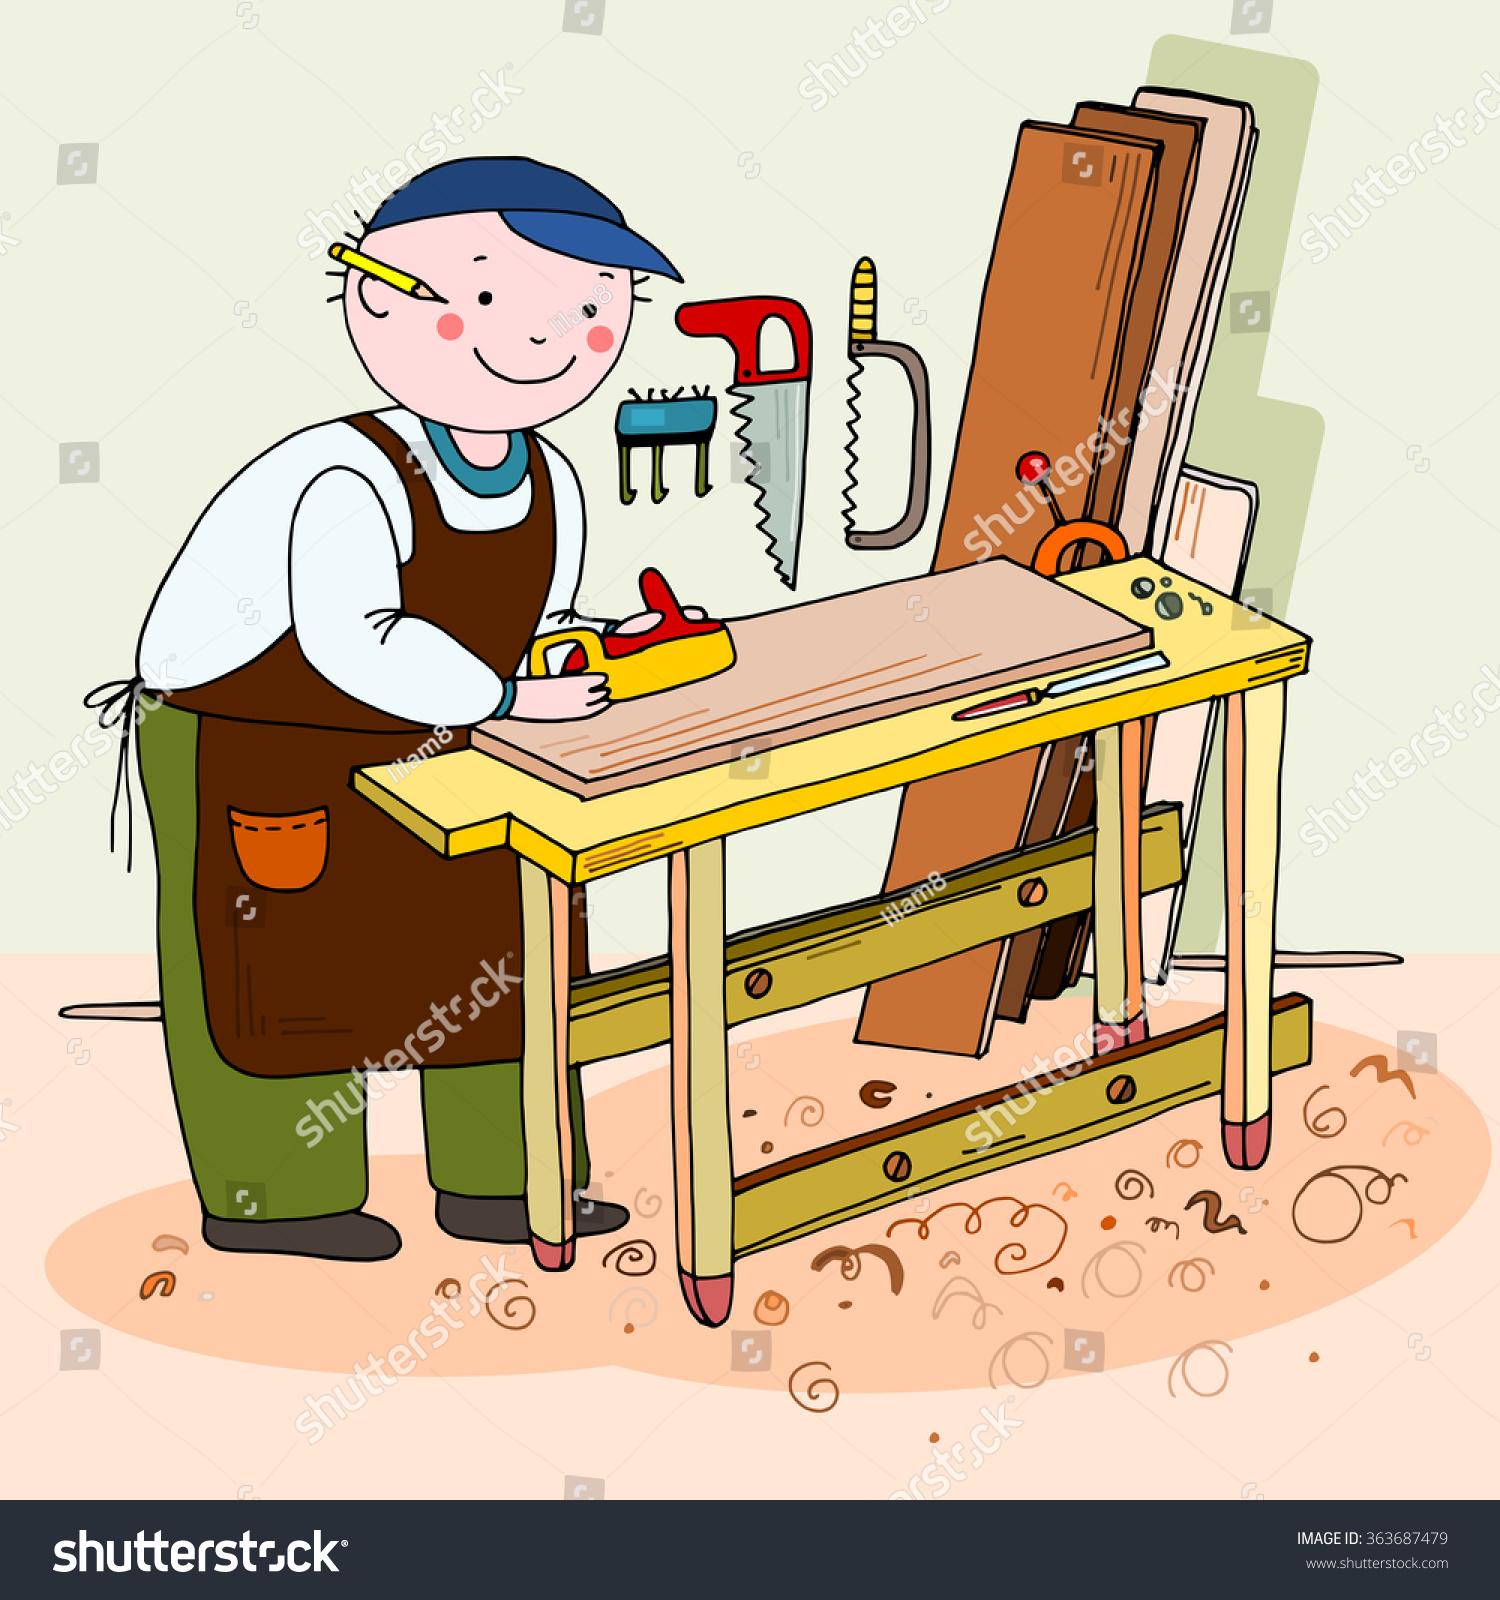 Cabinet Maker Clip Art: Carpenter Cabinetmaker Hand Drawn Vector Illustration